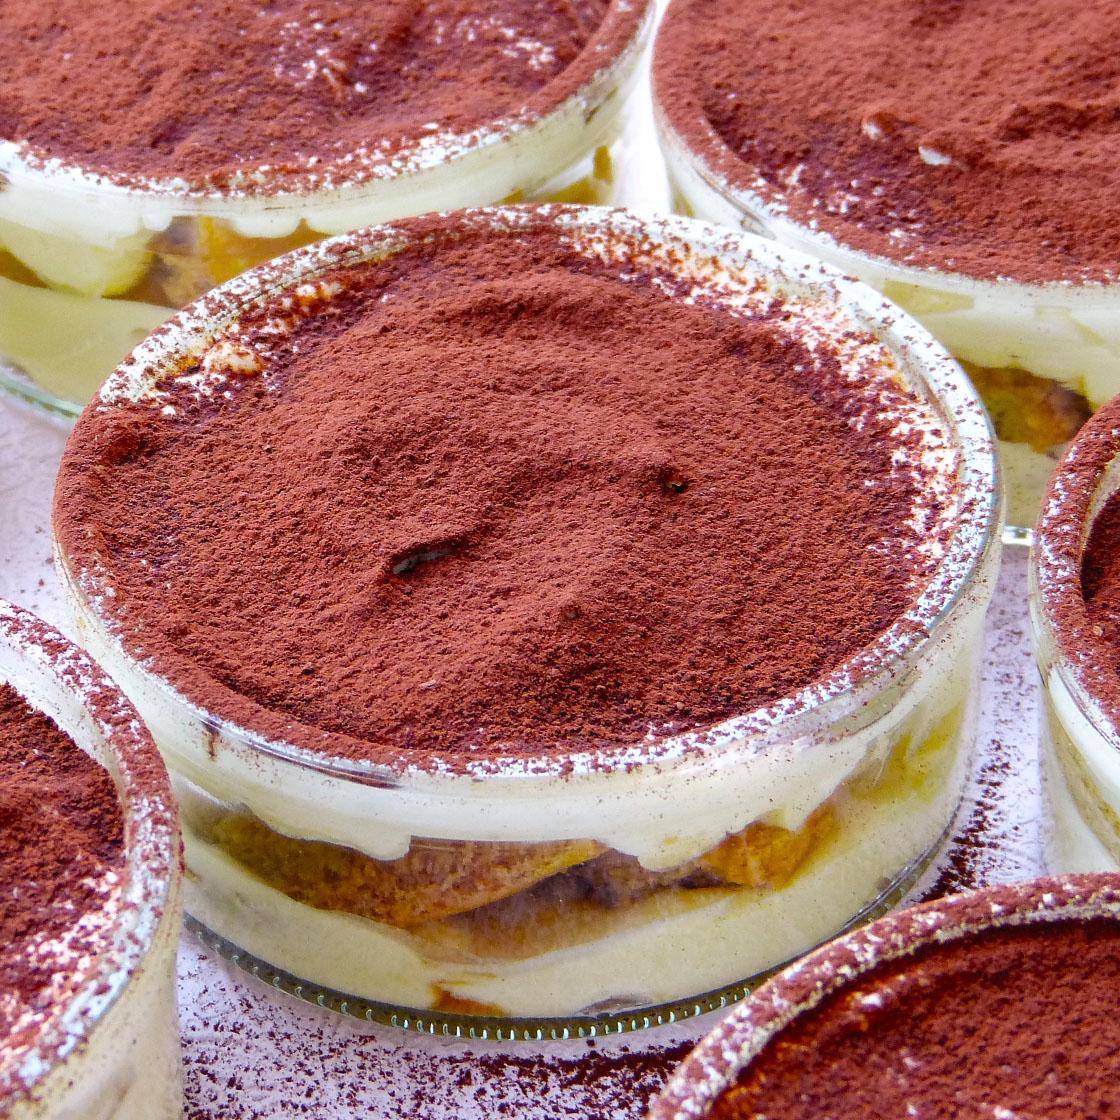 Ricetta Tiramisu Allo Yogurt Greco.Tiramisu Allo Yogurt Greco E Ricotta Cucina Amore Mio